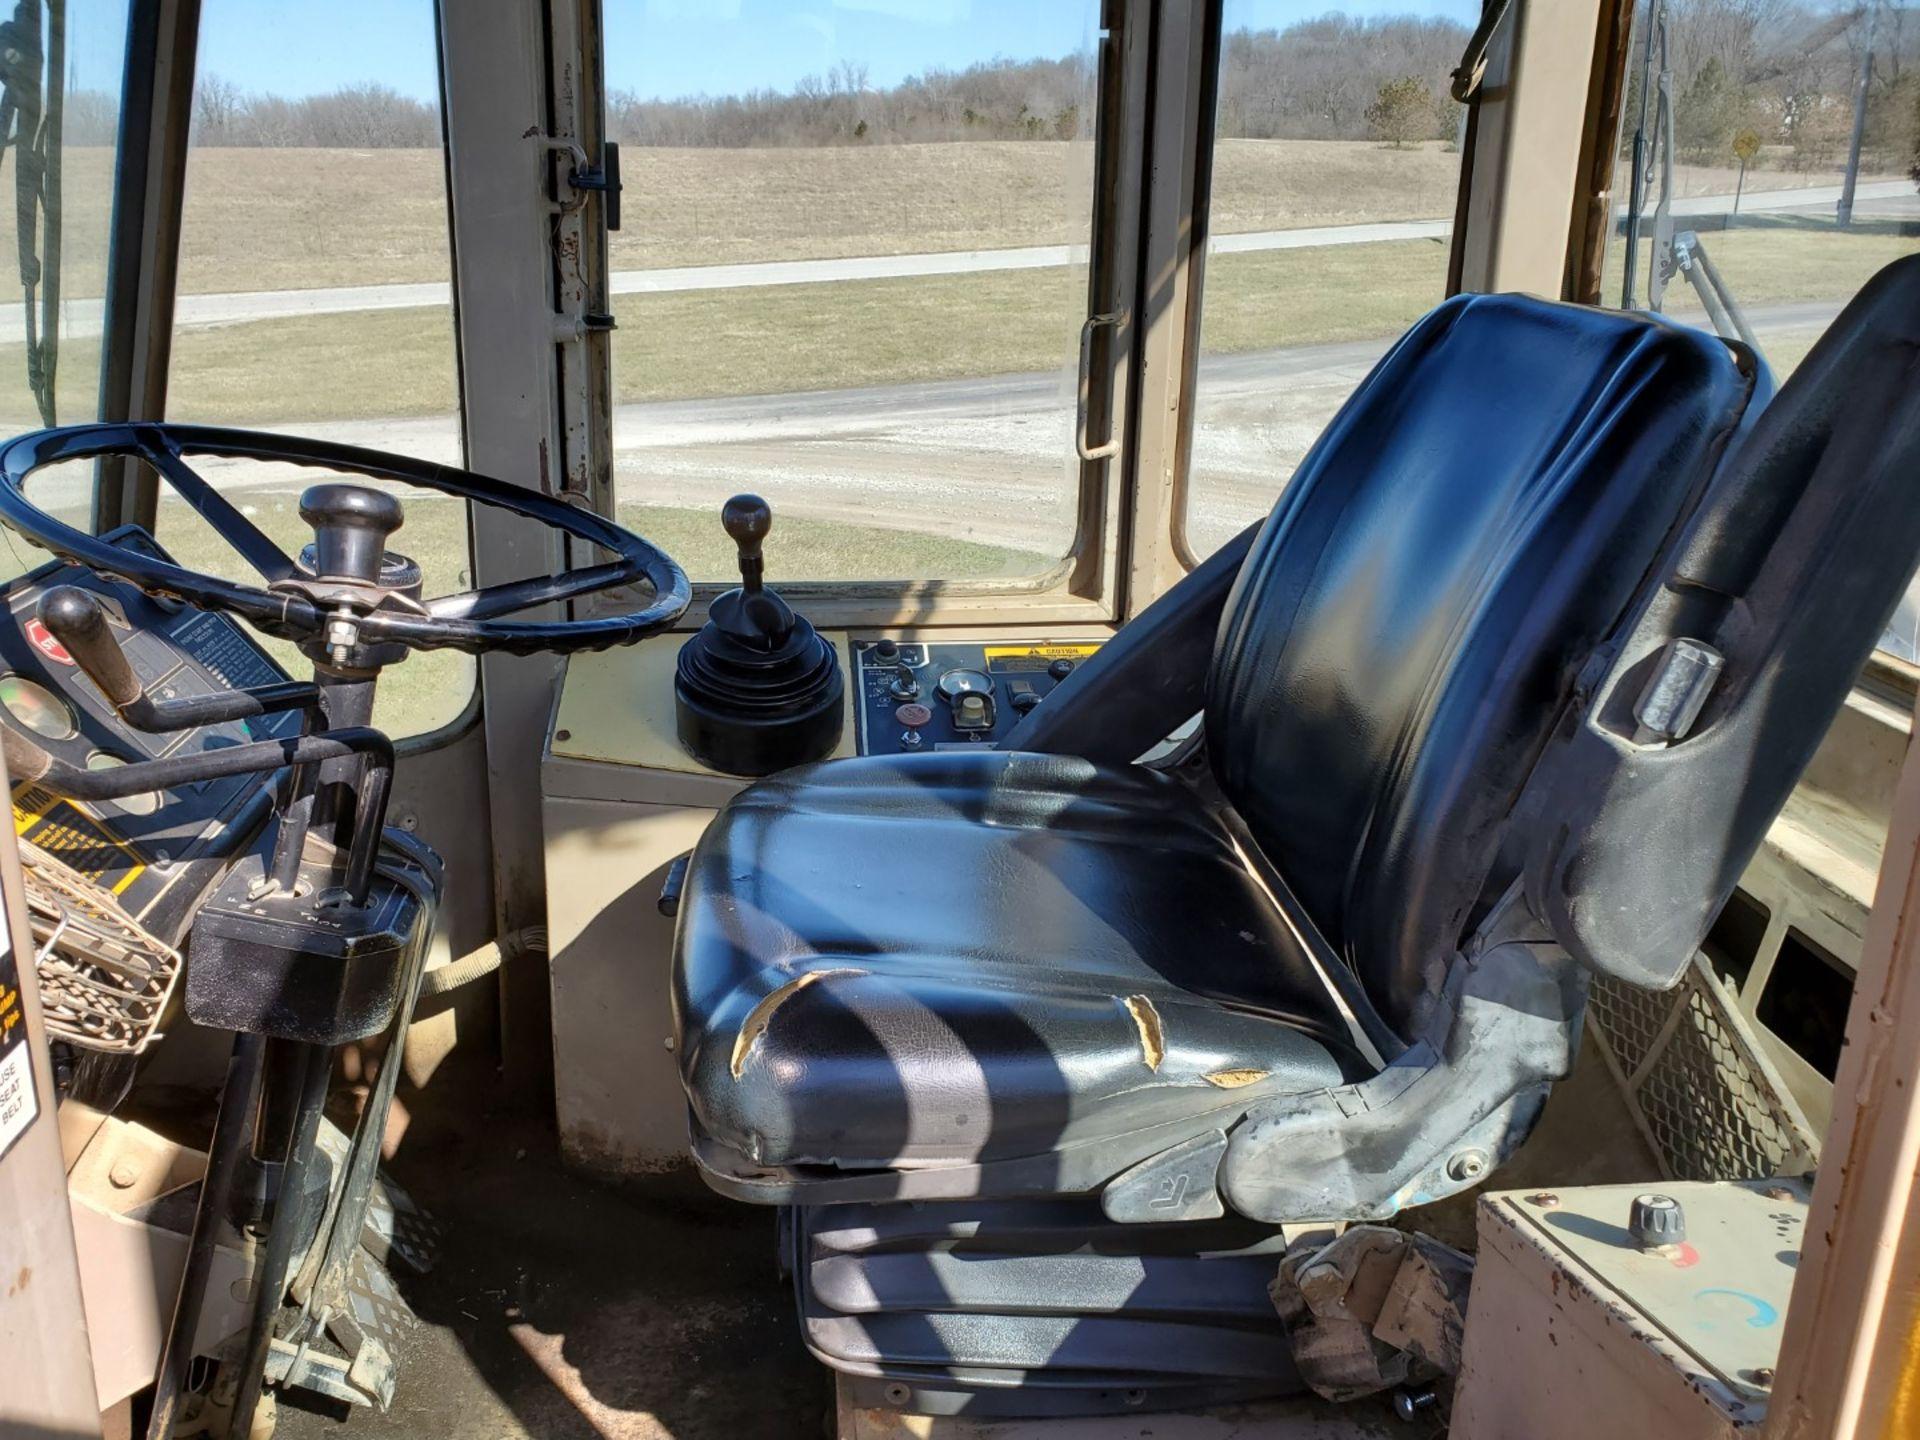 1989 John Deere Loader Model 644E w/ 3.5 CU Yard Bucket, Enclosed Cab, 13,449 Hours, All New Tires - Image 16 of 30